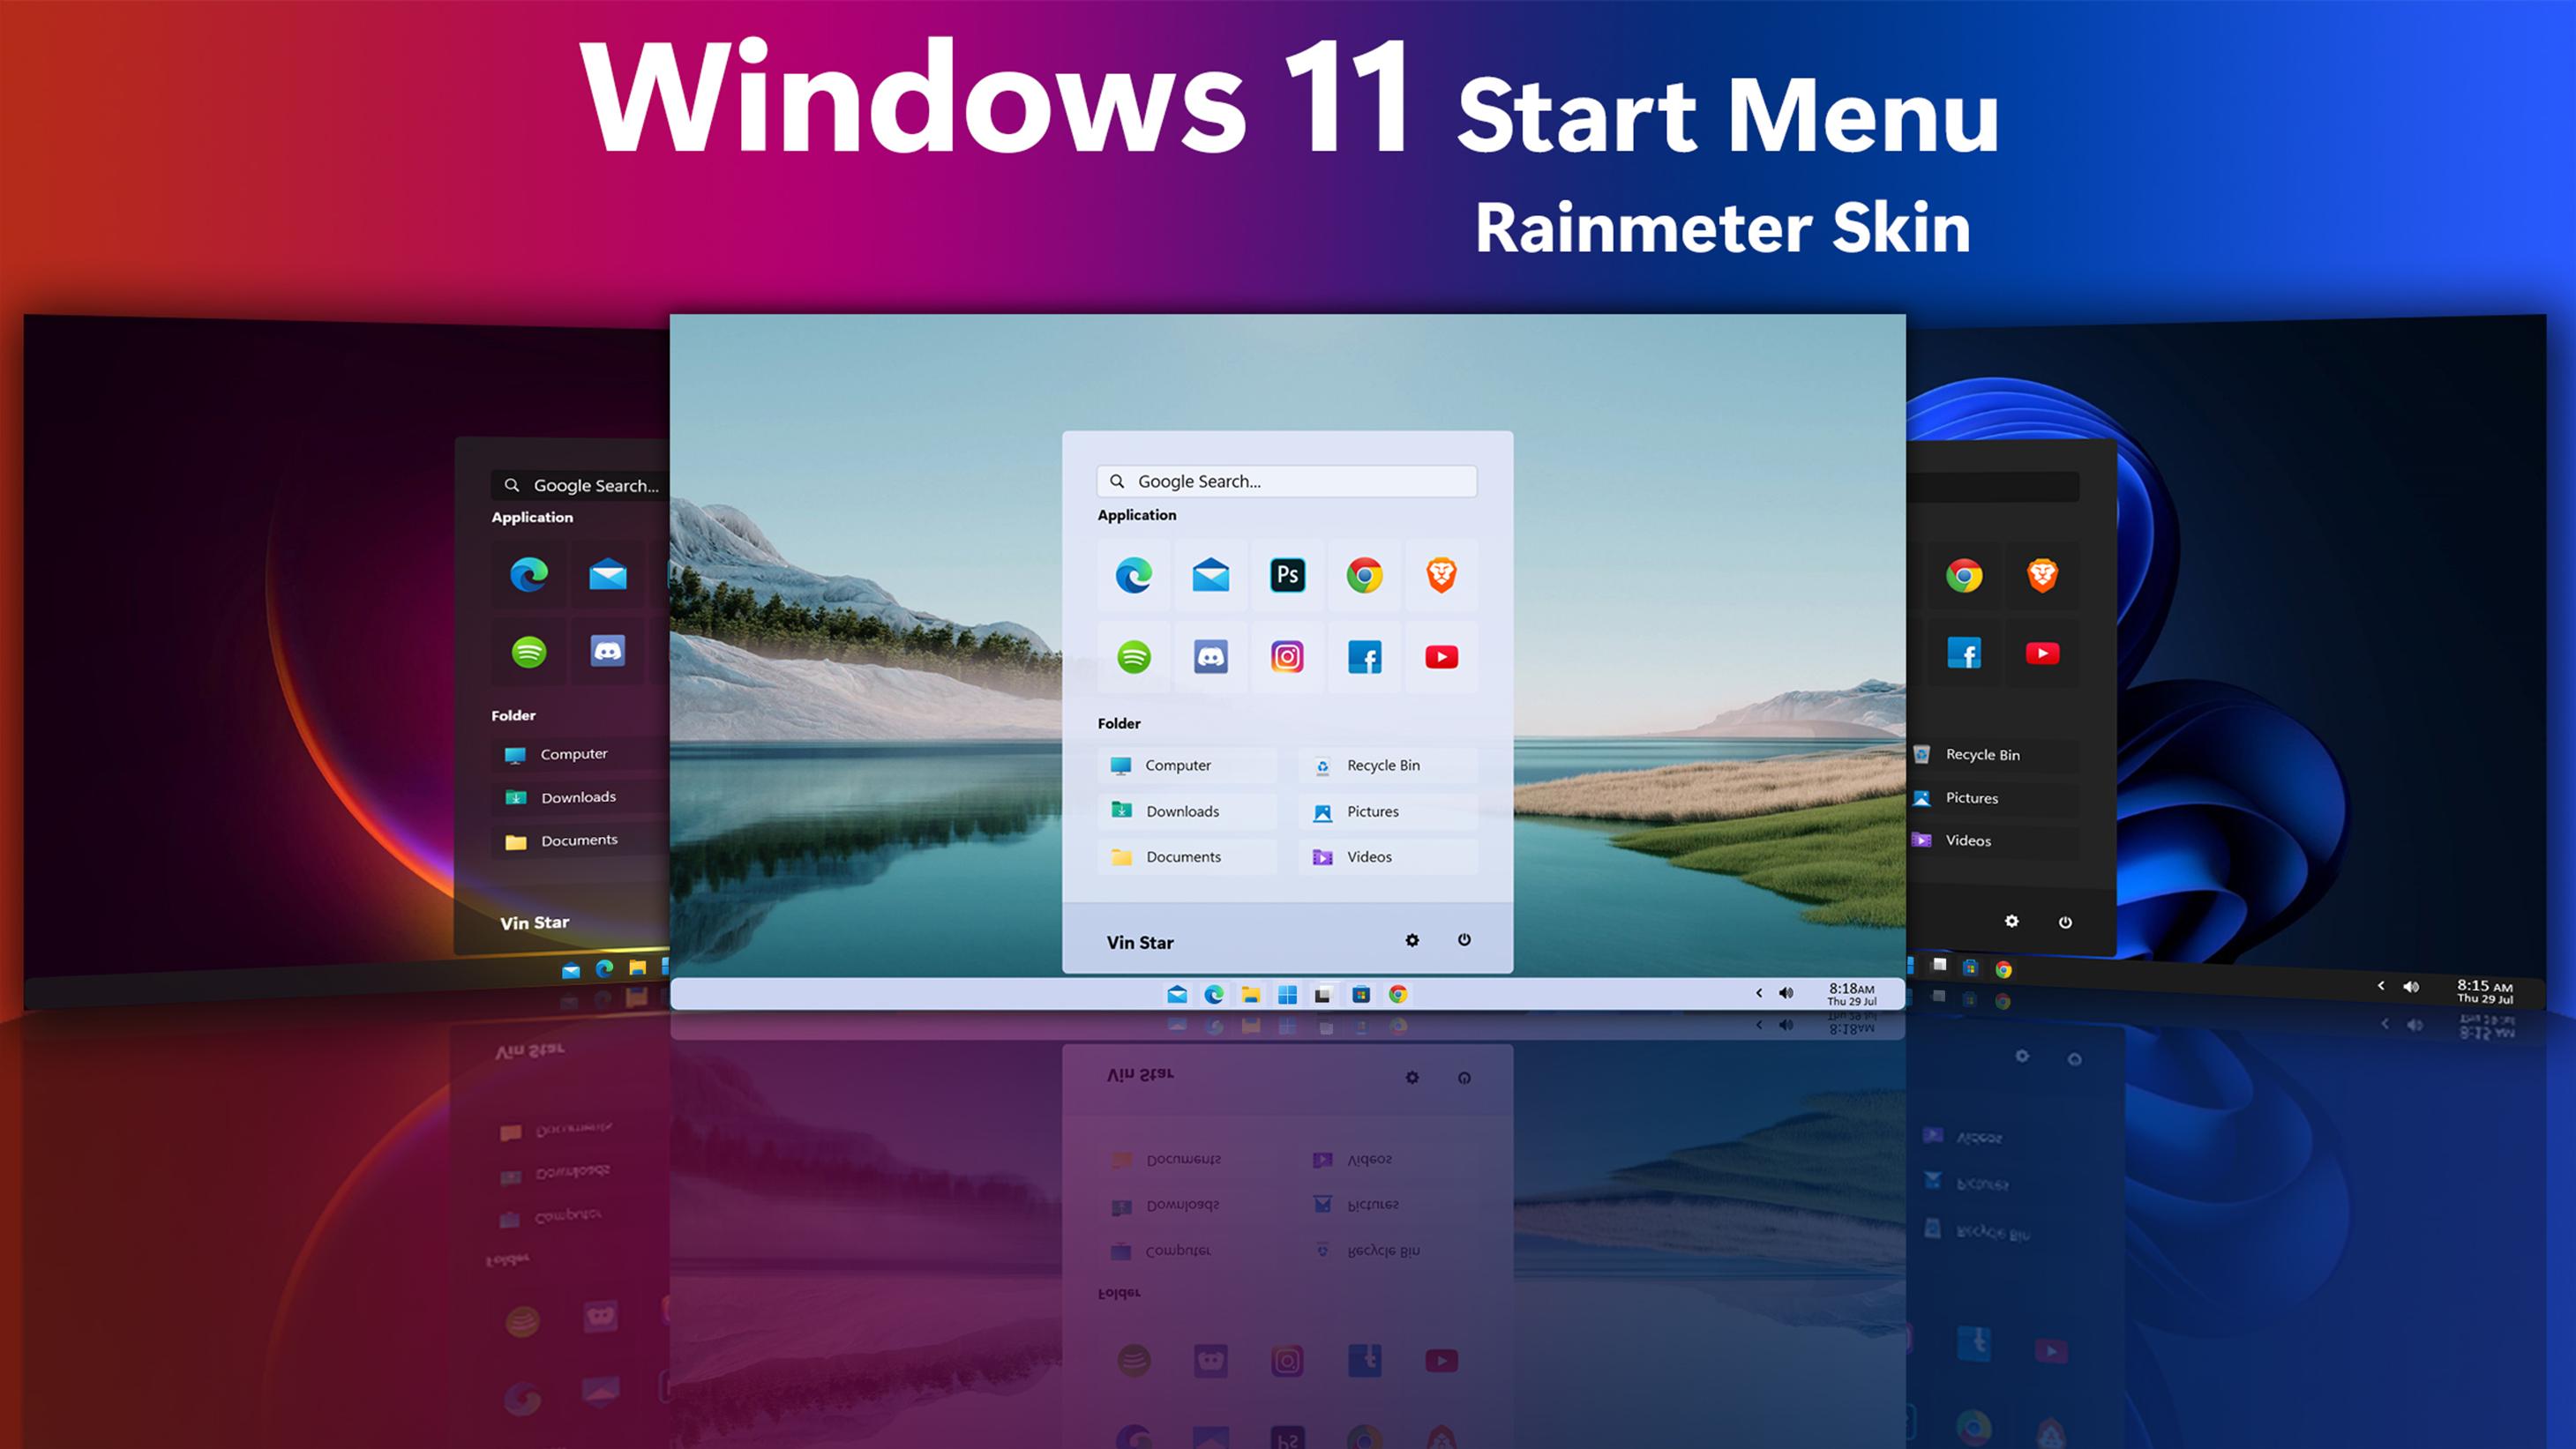 Windows 11 Start Menu